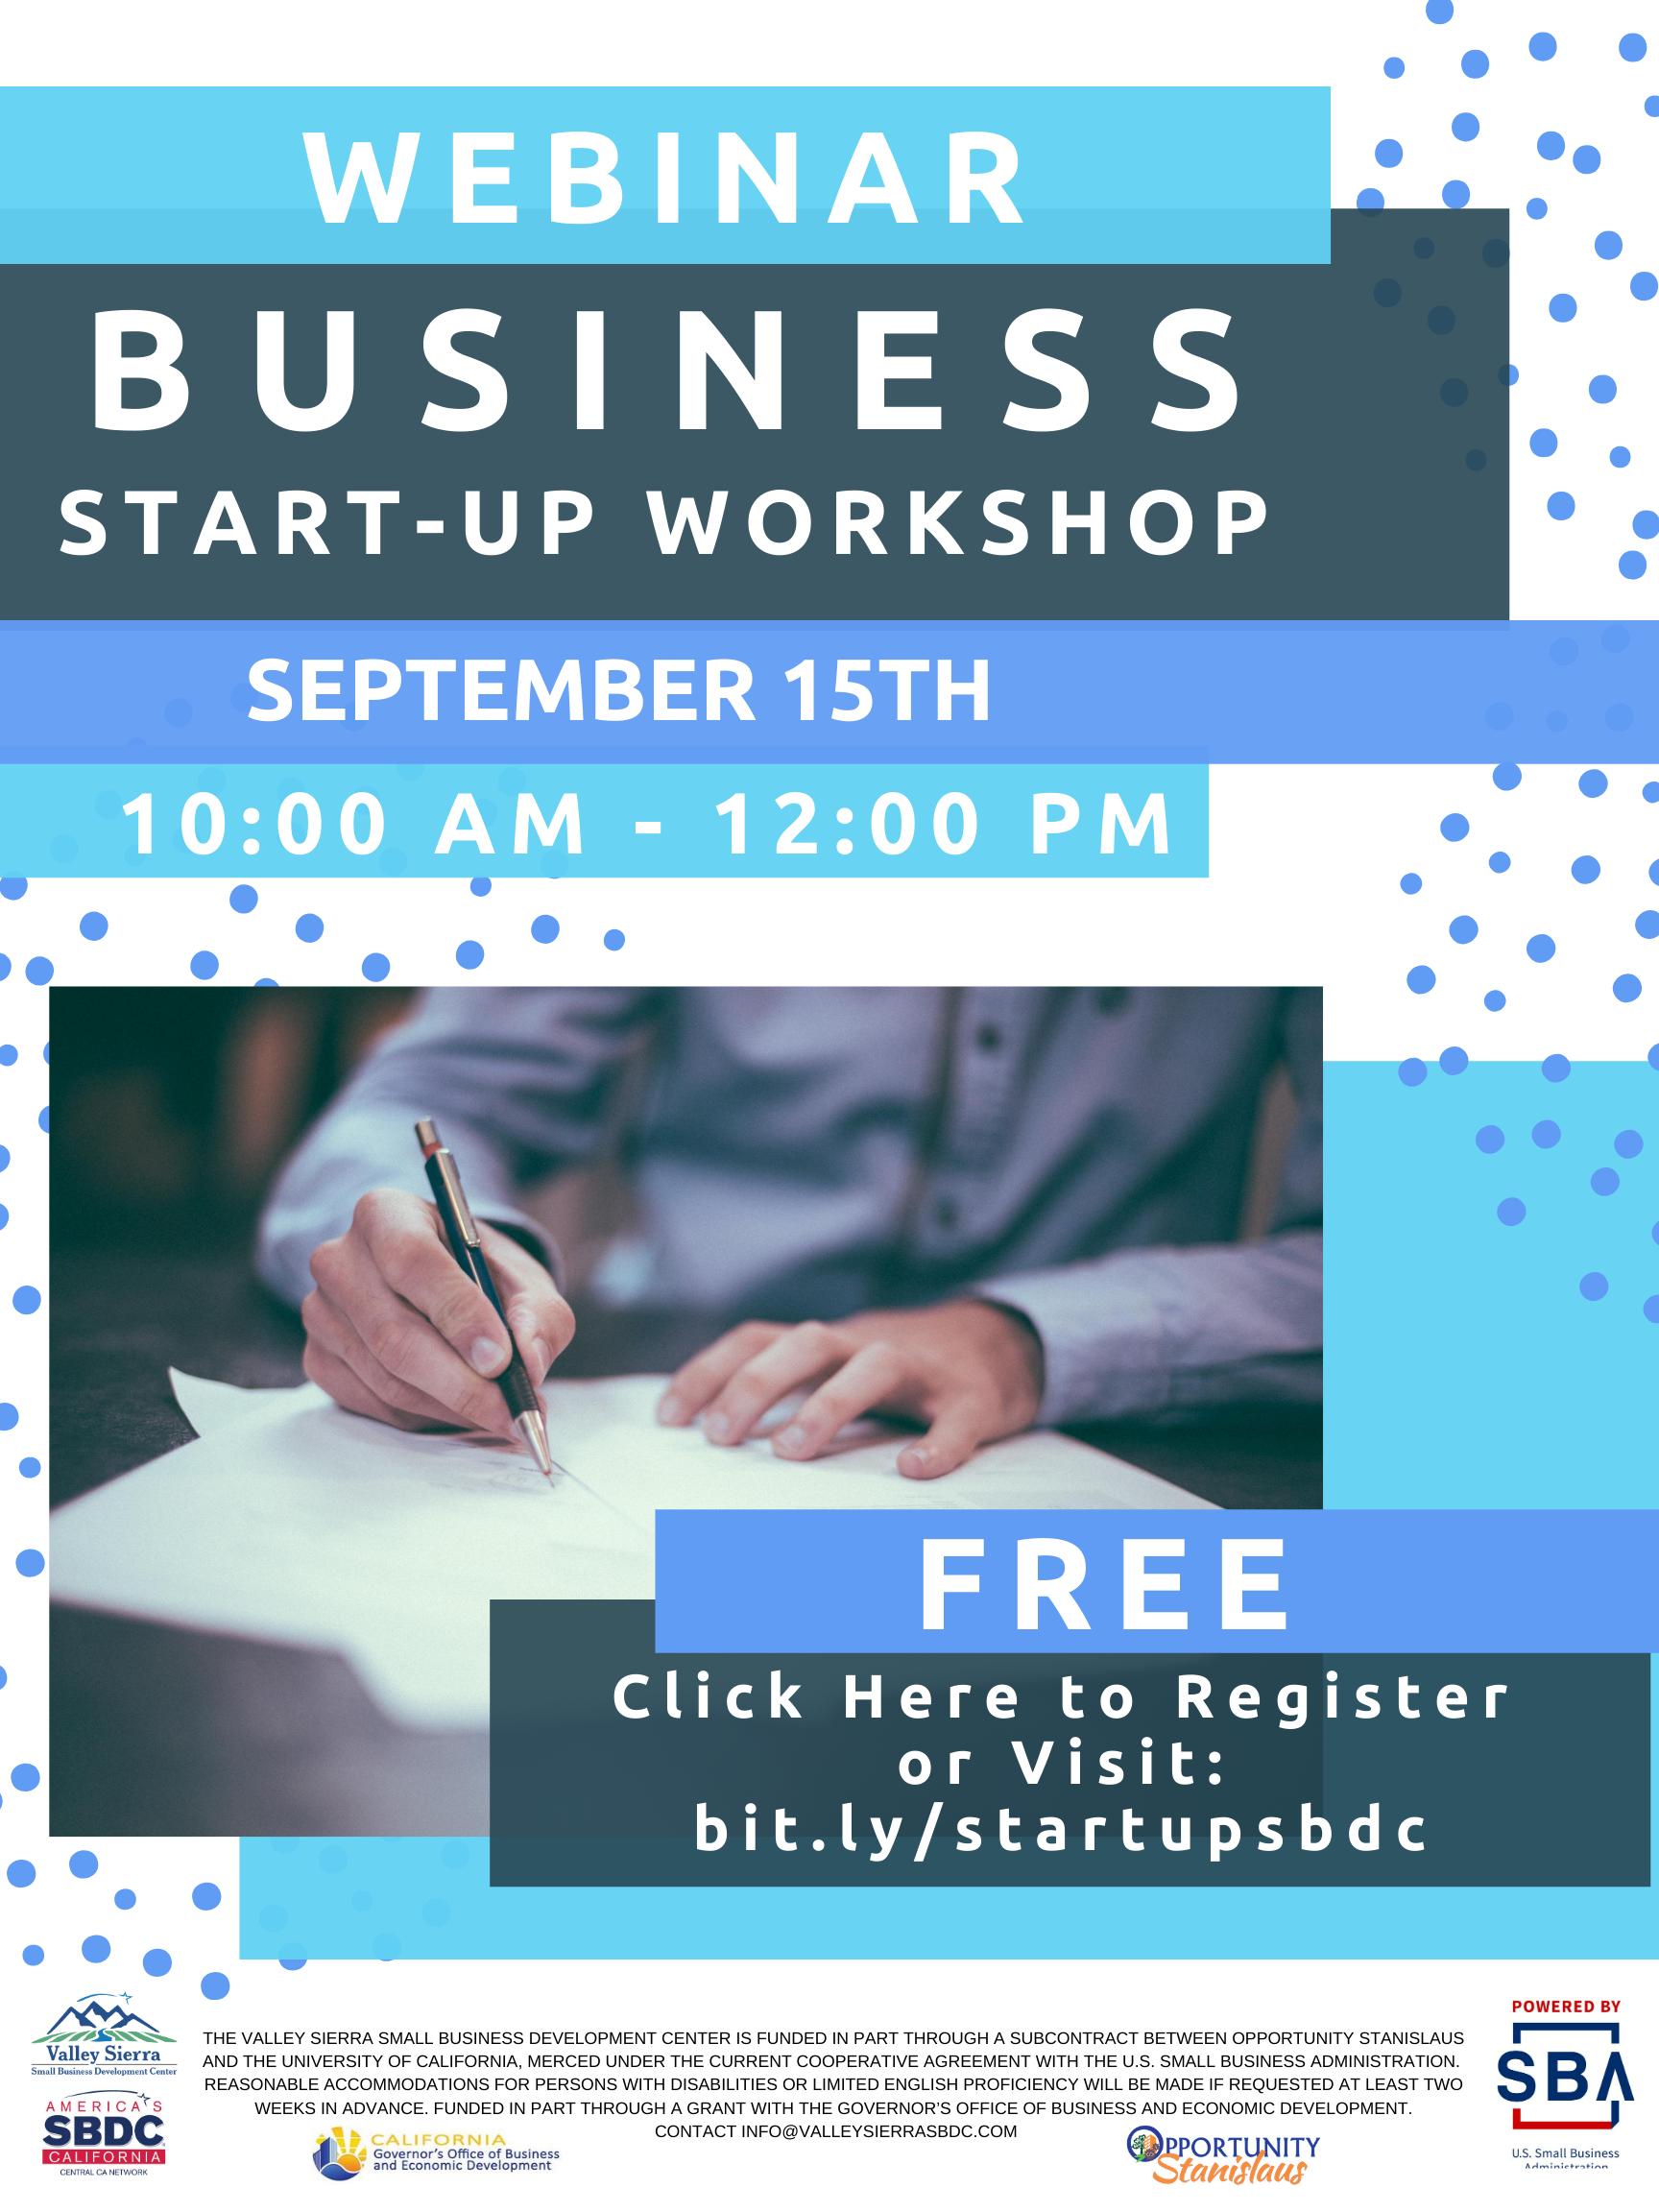 business start-up flyer